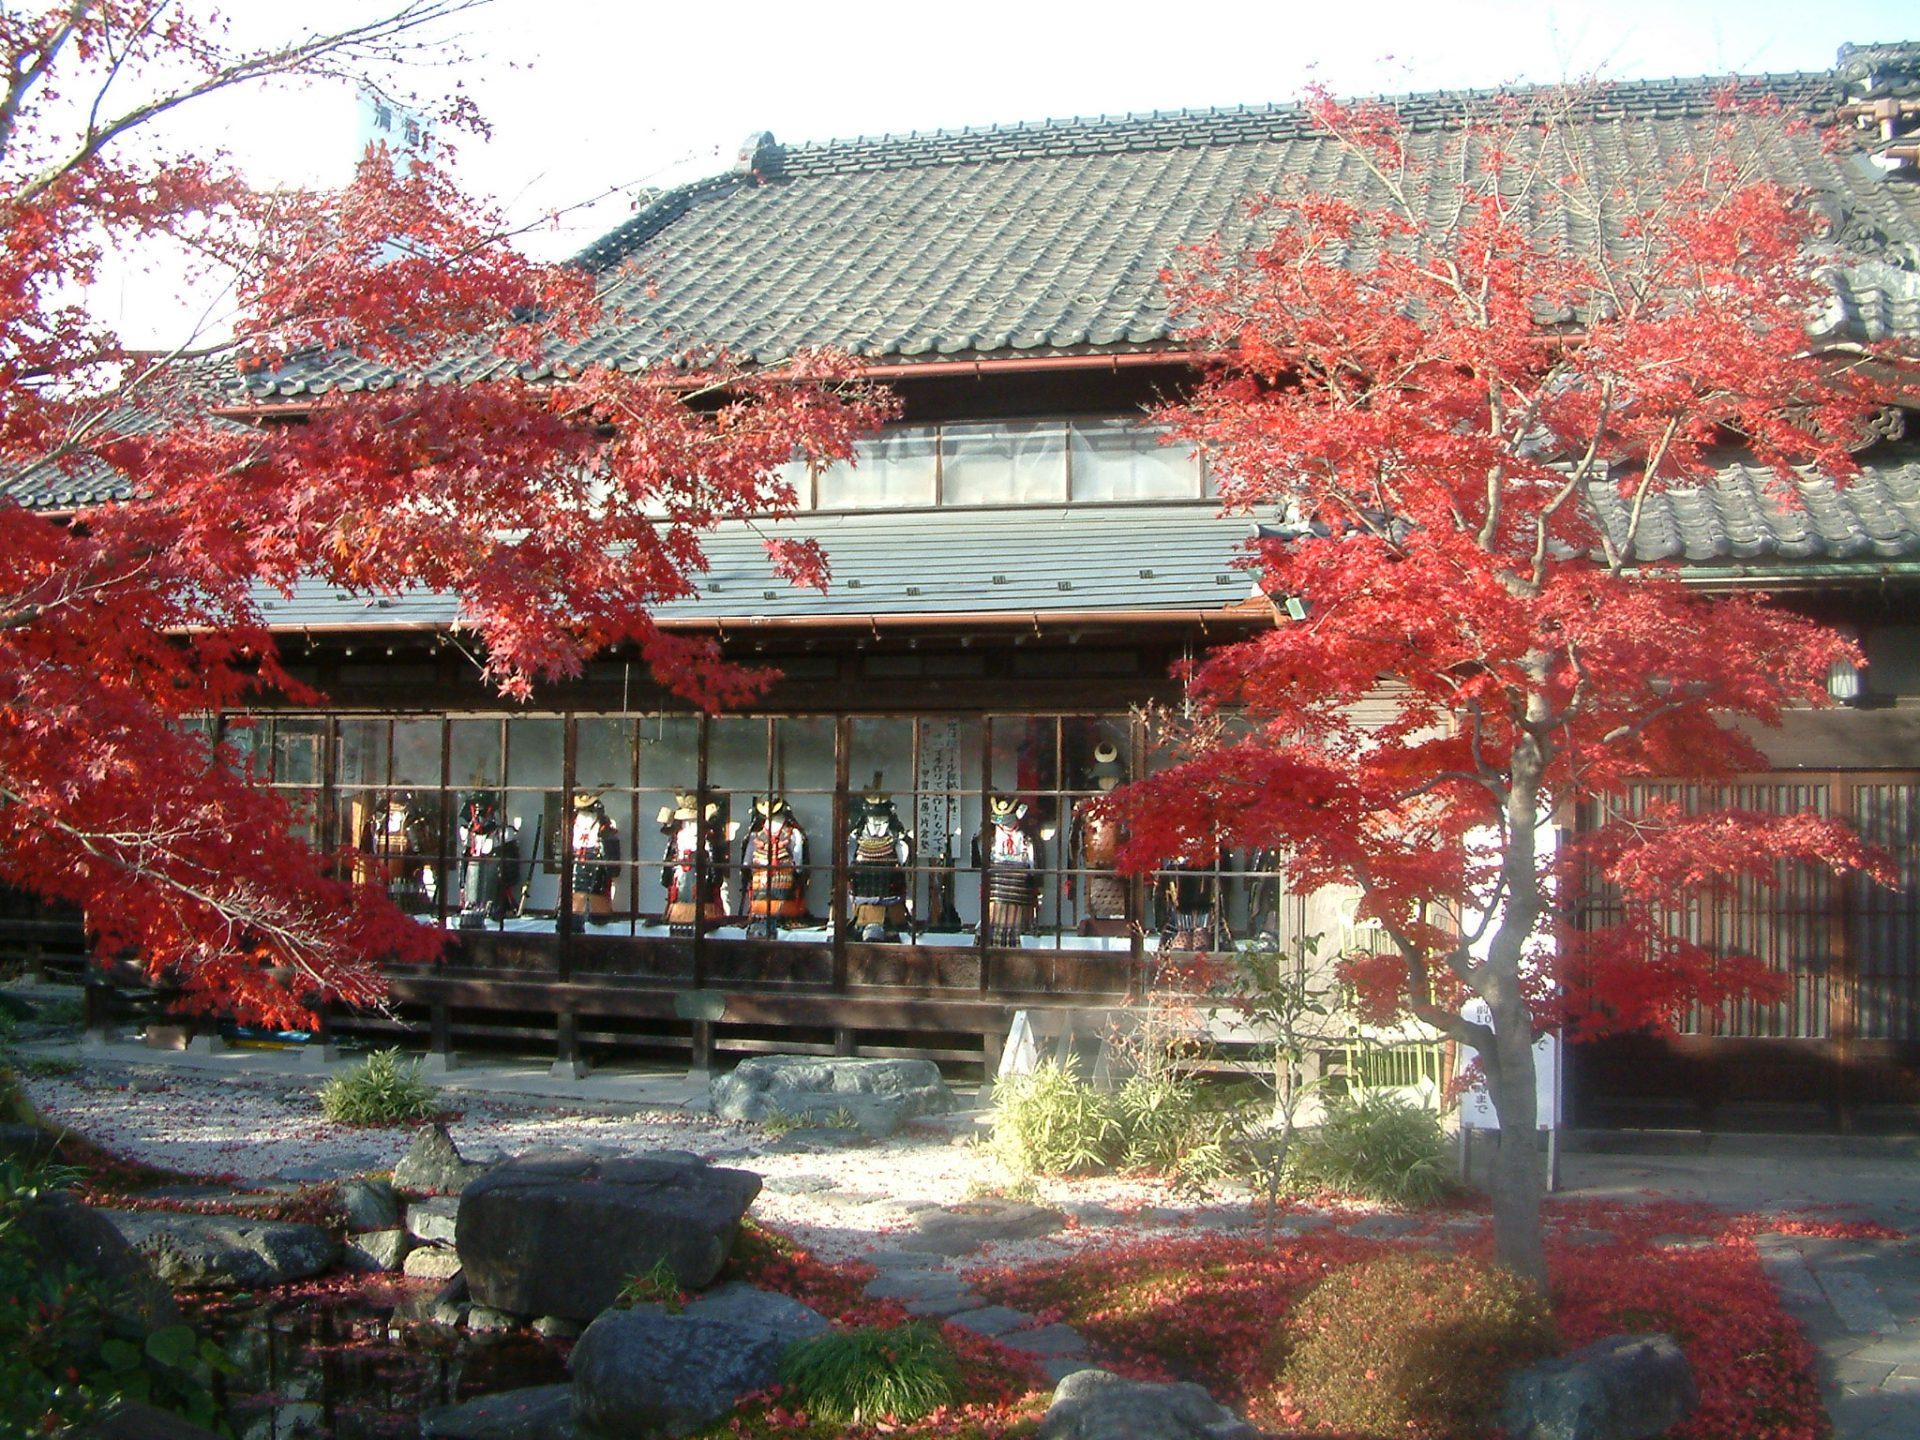 壽丸屋敷(Sumaruyashiki)